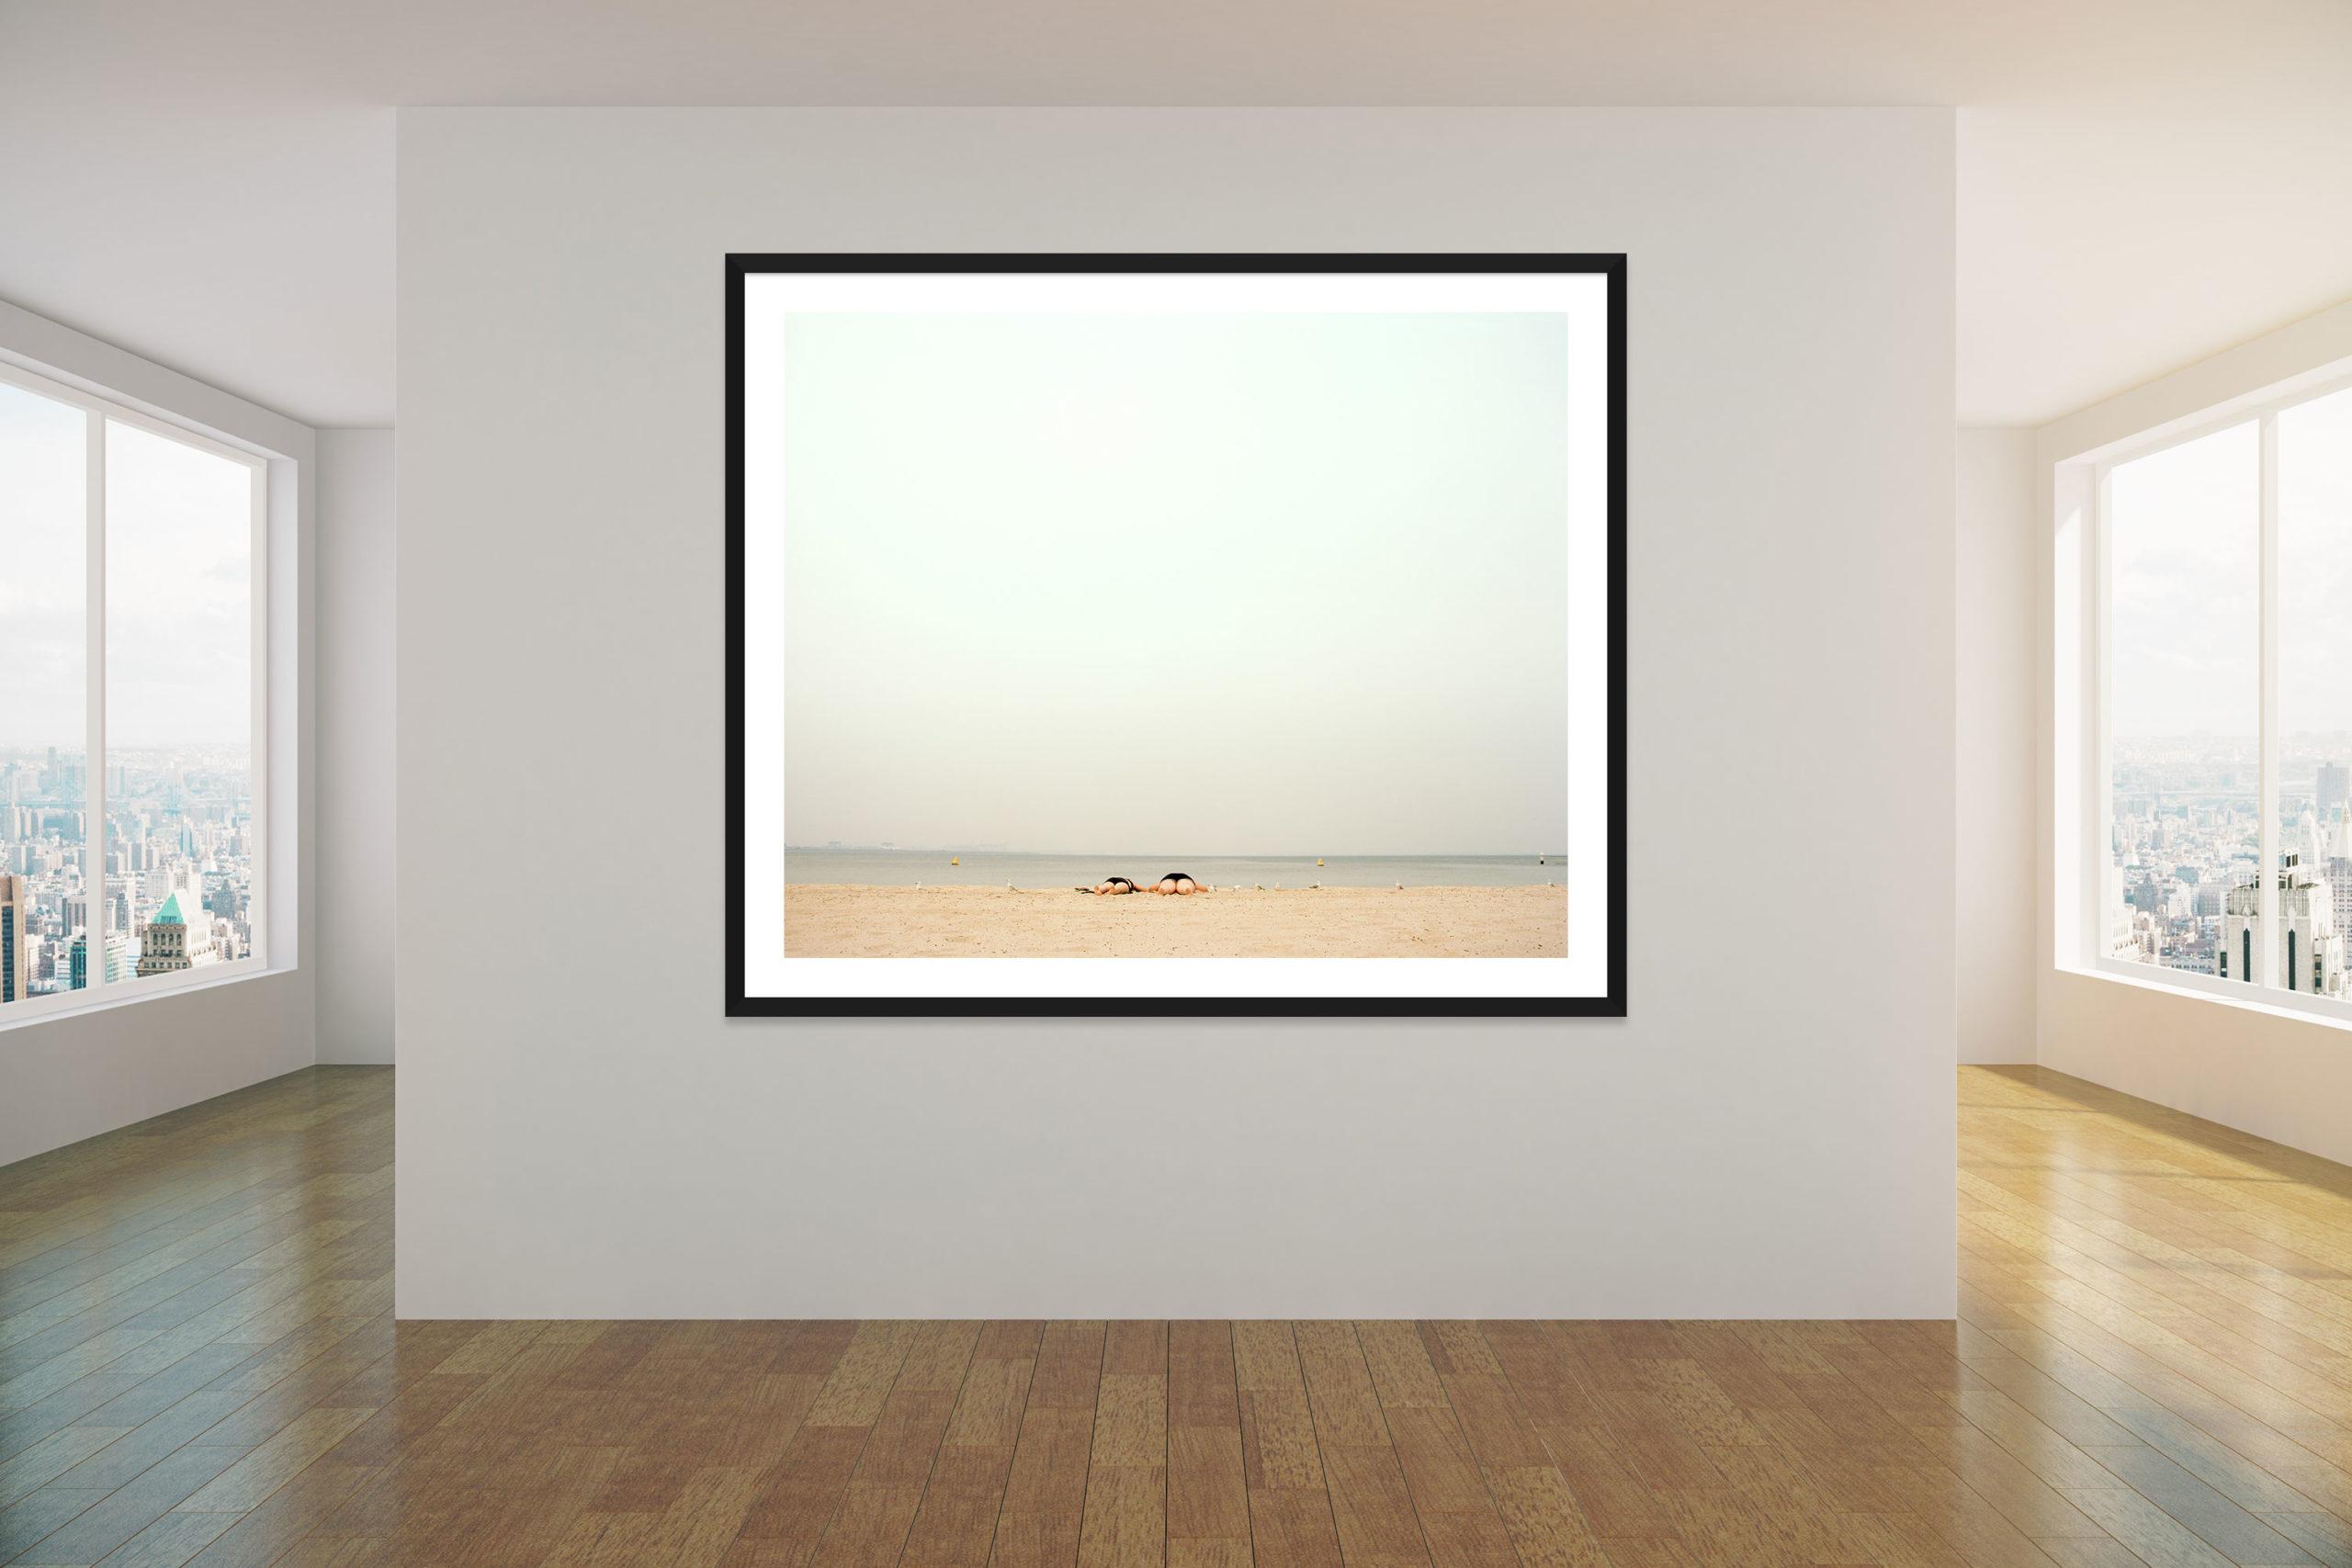 Legs - Black Frame - Concrete Collection - Fine Art Photography by Toby Dixon